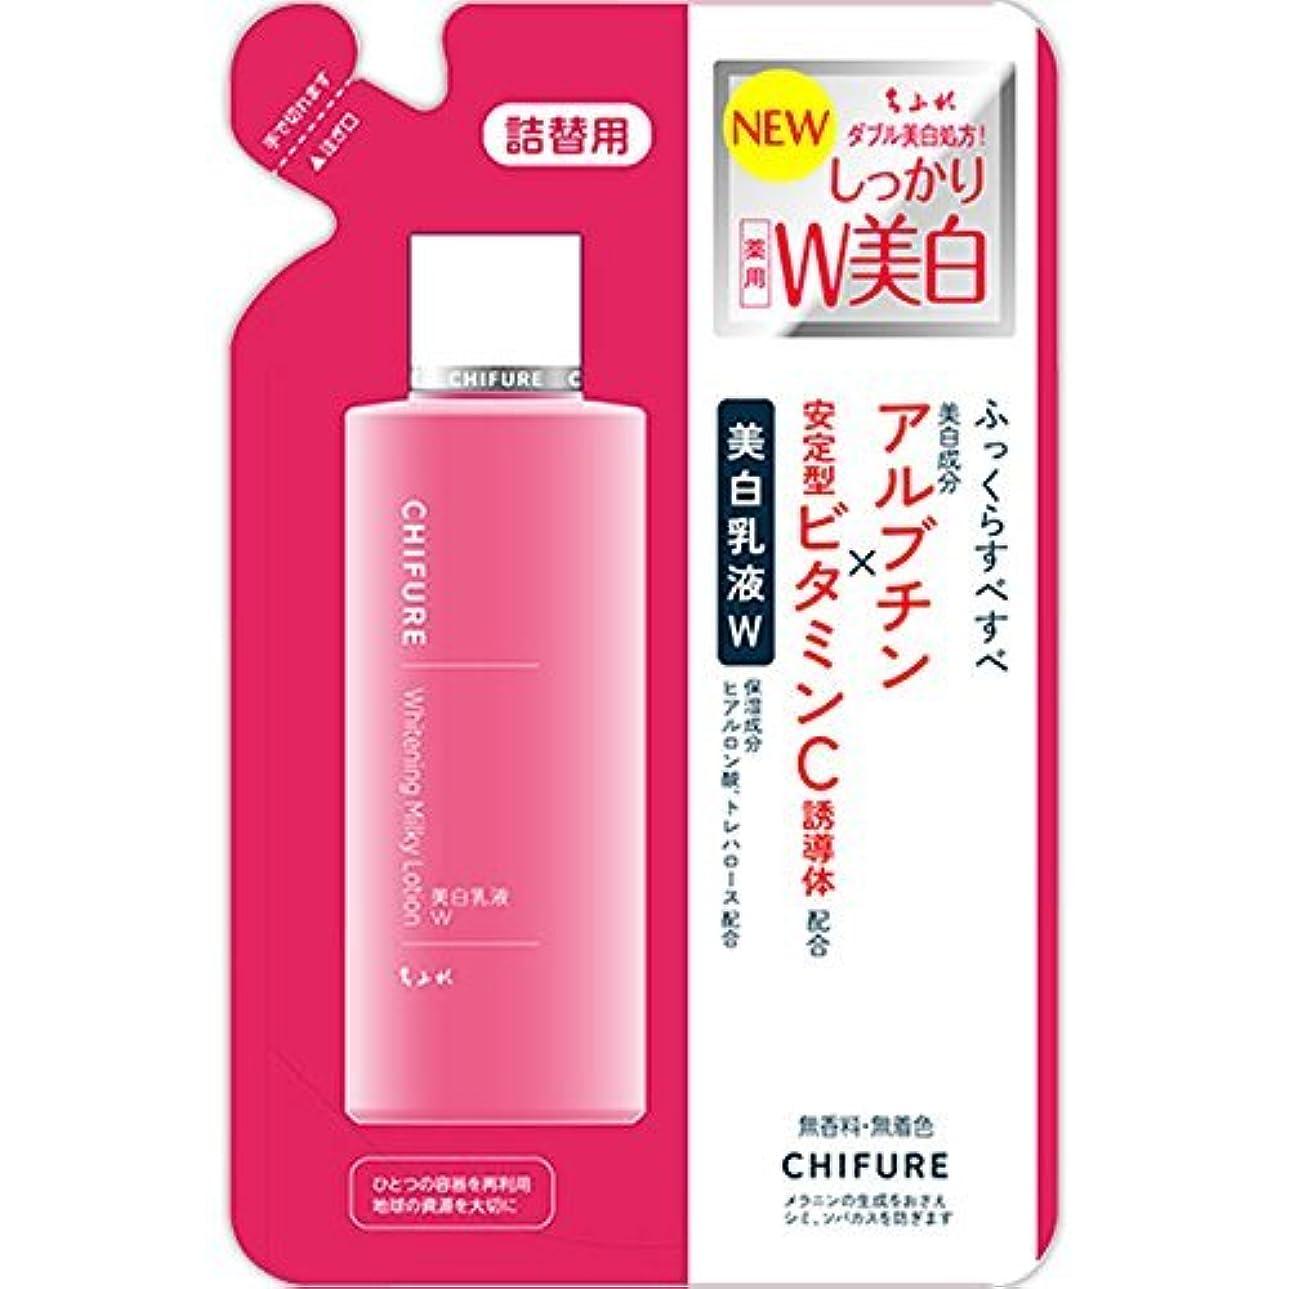 雑種夏窒素ちふれ化粧品 美白乳液 W 詰替 150ML (医薬部外品)